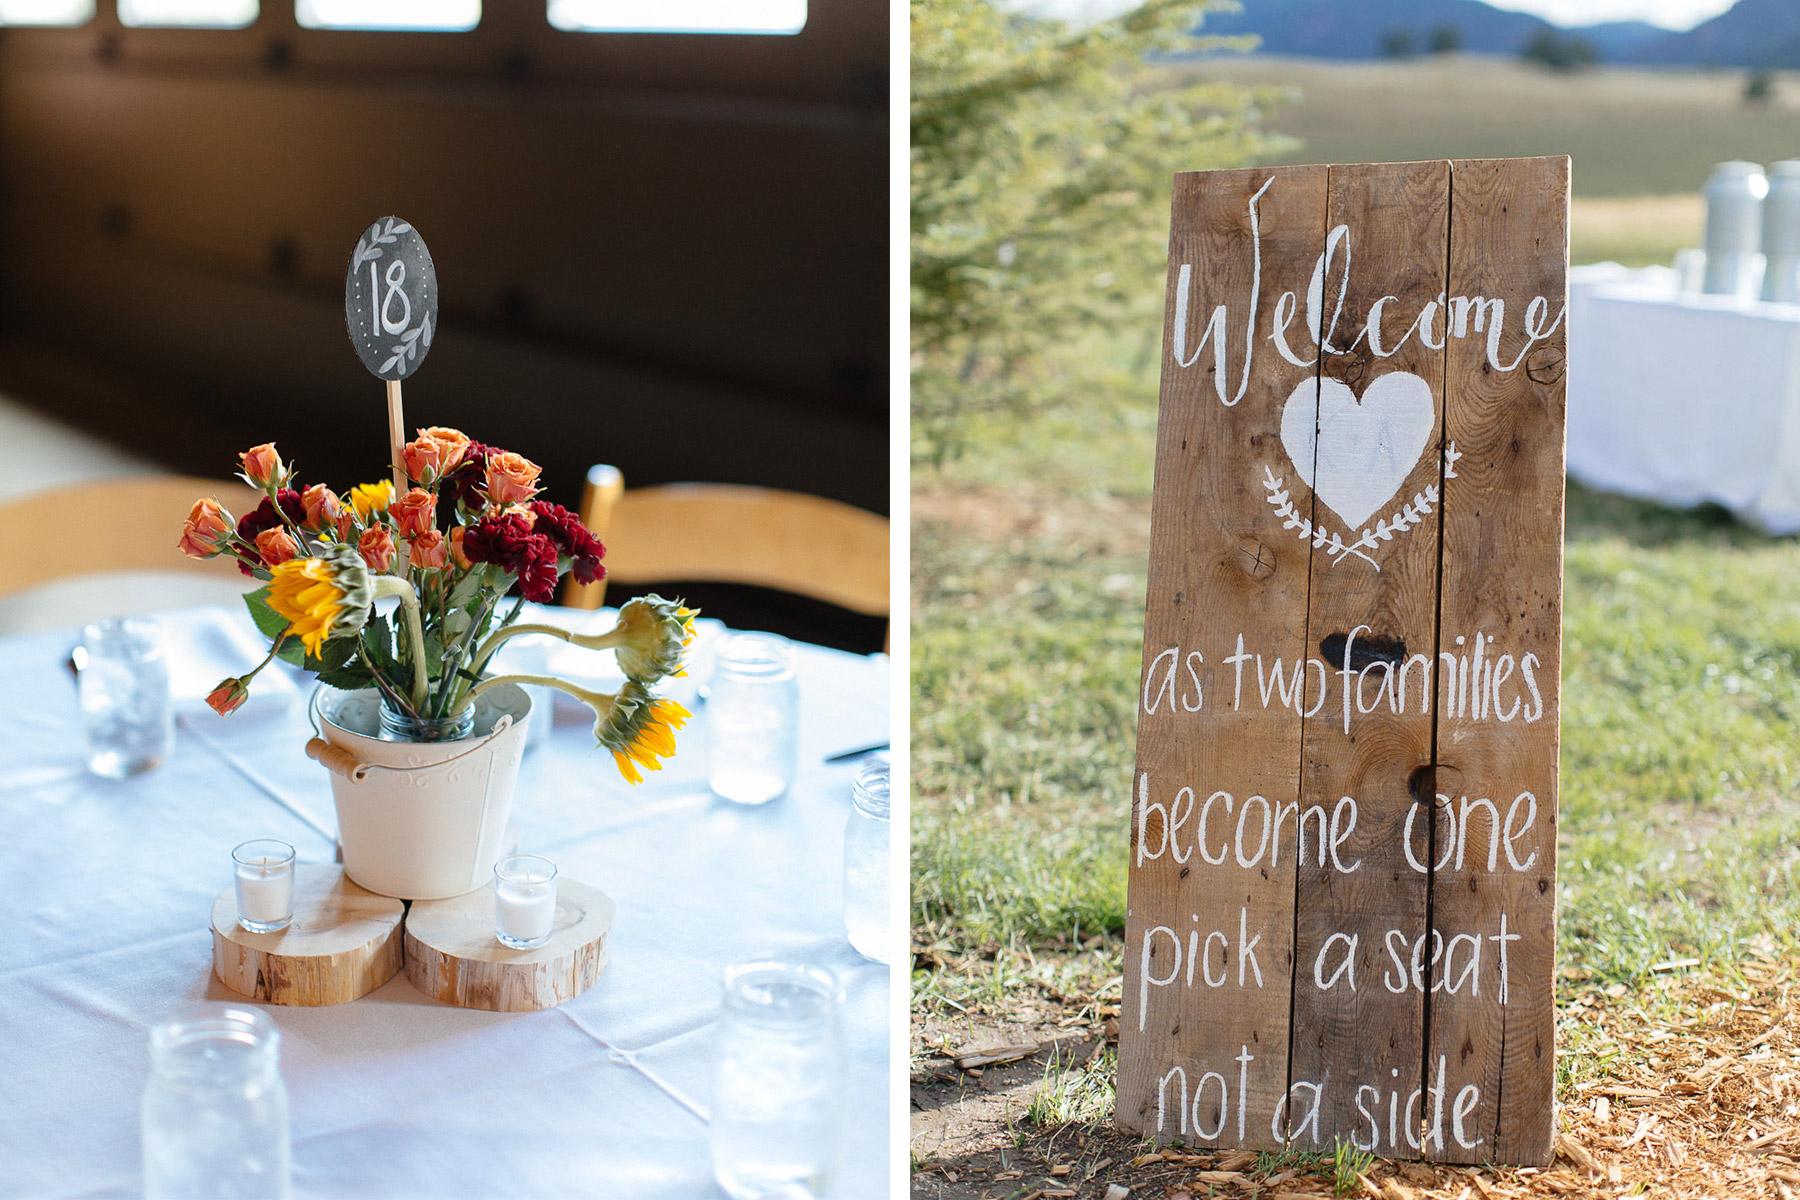 160902-Luxium-Weddings-Arizona-Michael-Becca-Spruce-Mountain-Ranch-Colorado-webres-050a.jpg